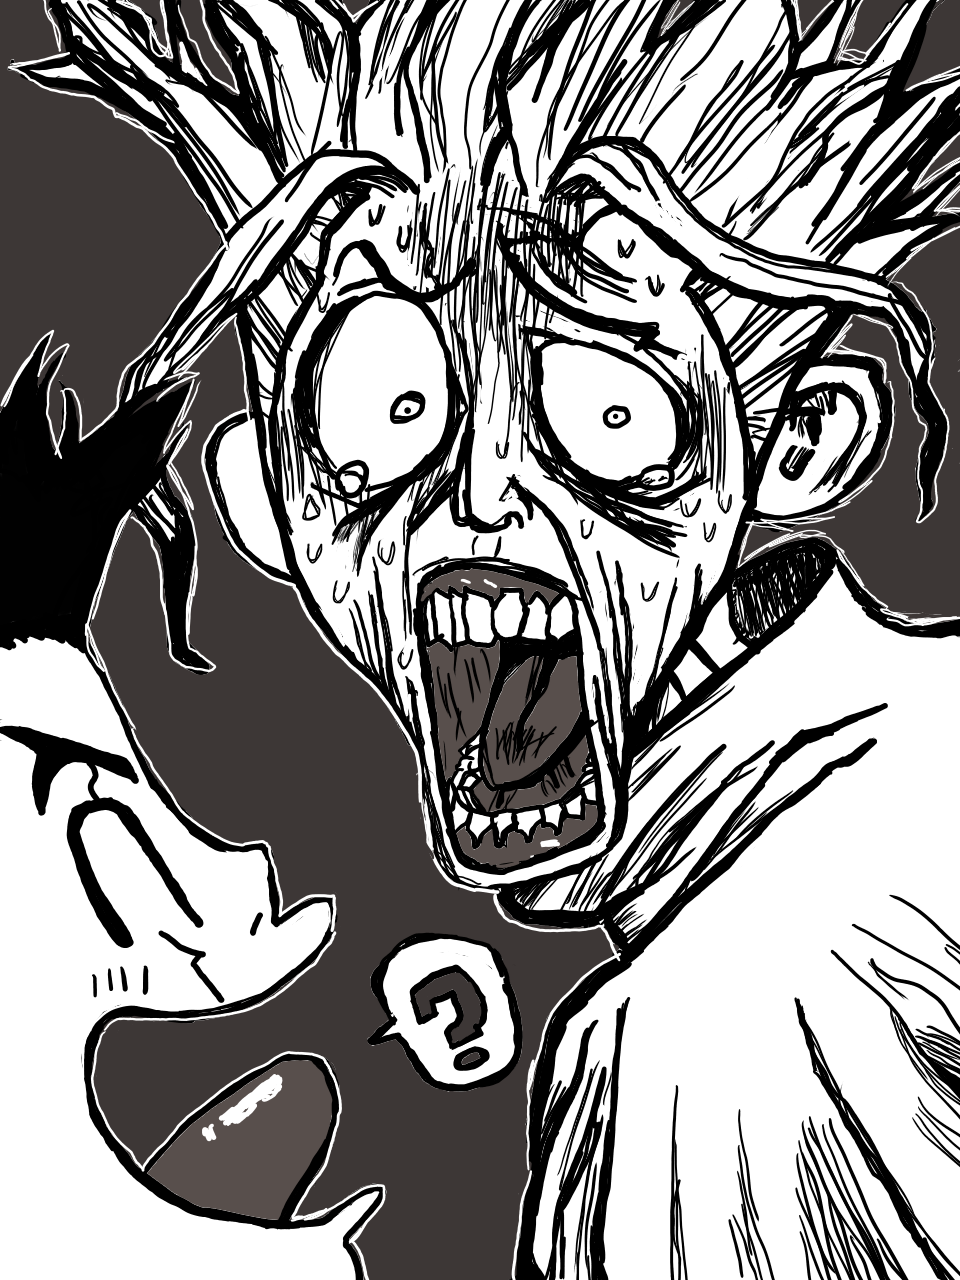 Primeros dibujos Illust of Galix0714 PrimerasCreaciones manga medibangpaint